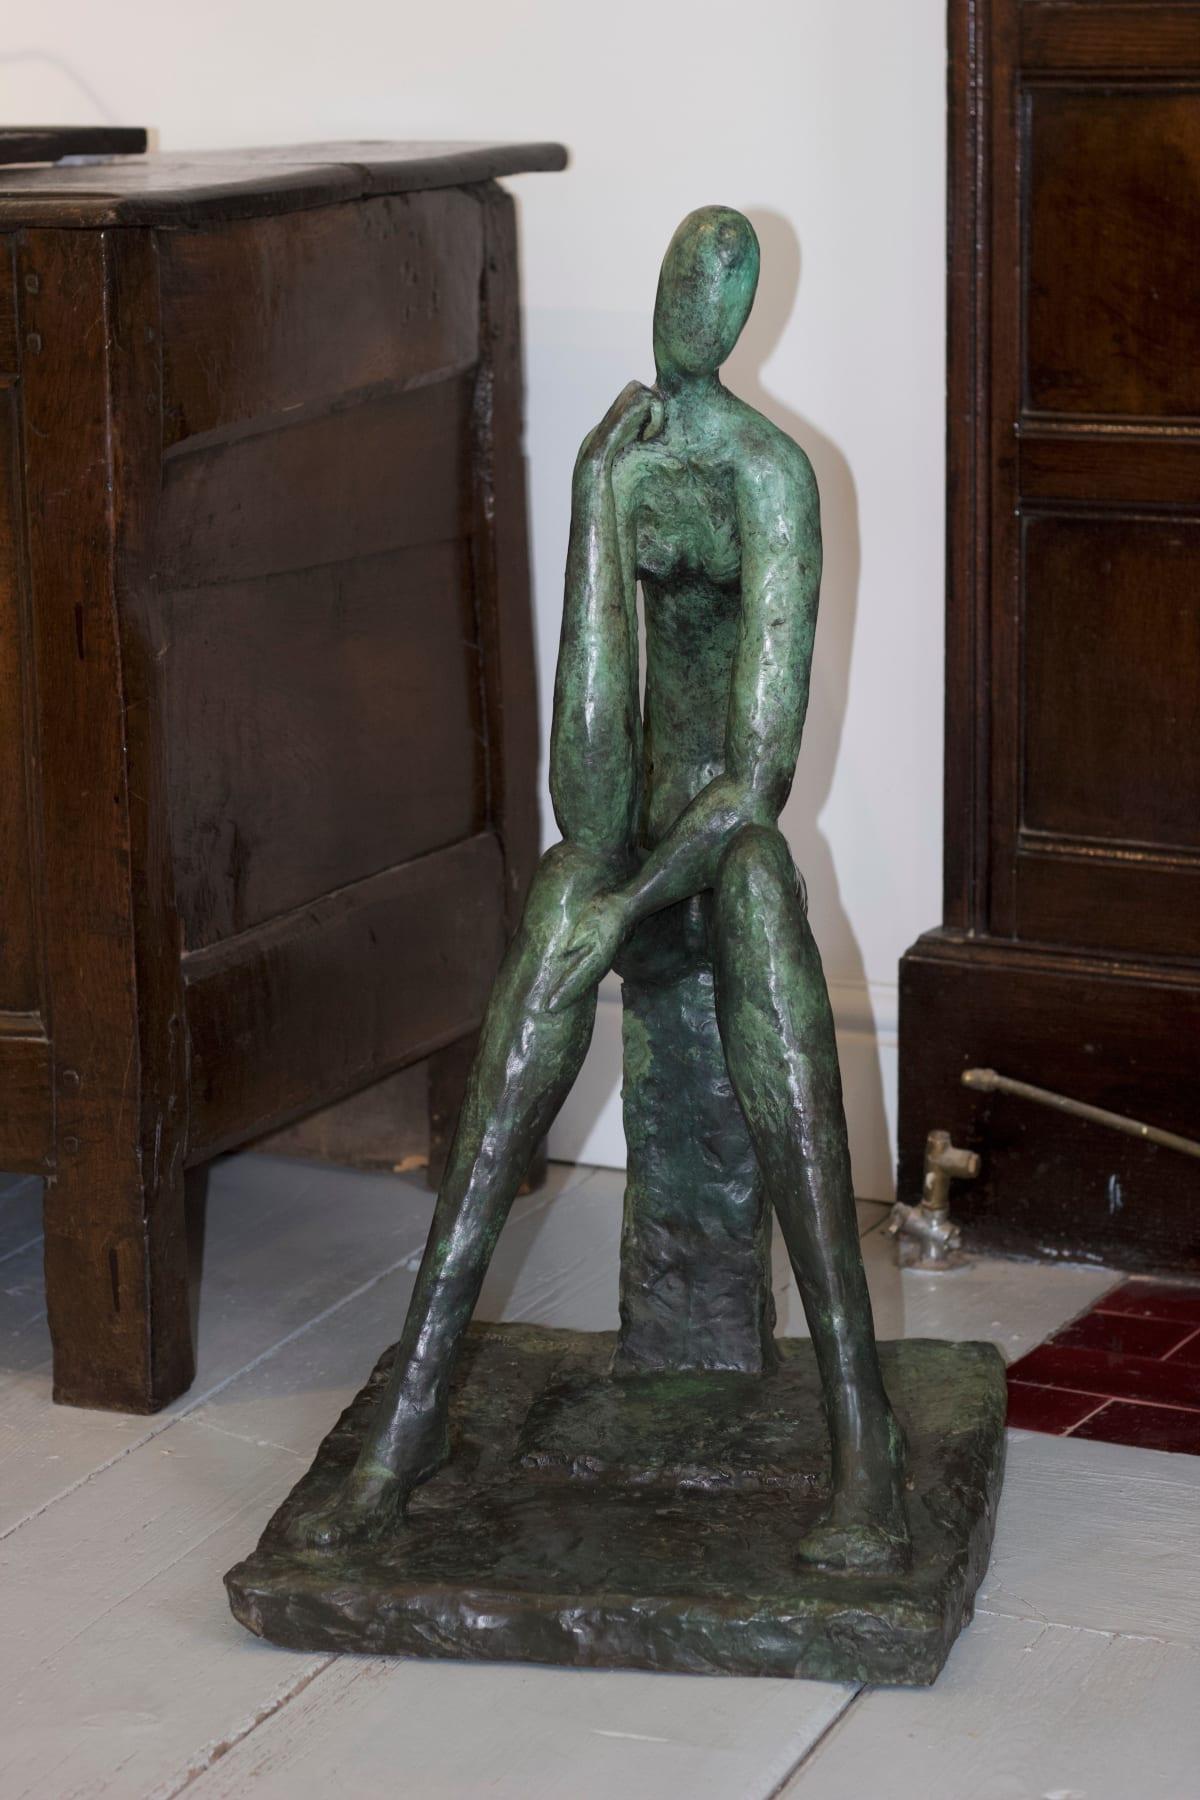 Helen Sinclair Sophistry, 2017 Bronze Sculpture 71 x 36 x 43 cm 28 x 14 1/8 x 16 7/8 in Edition 6 of 7